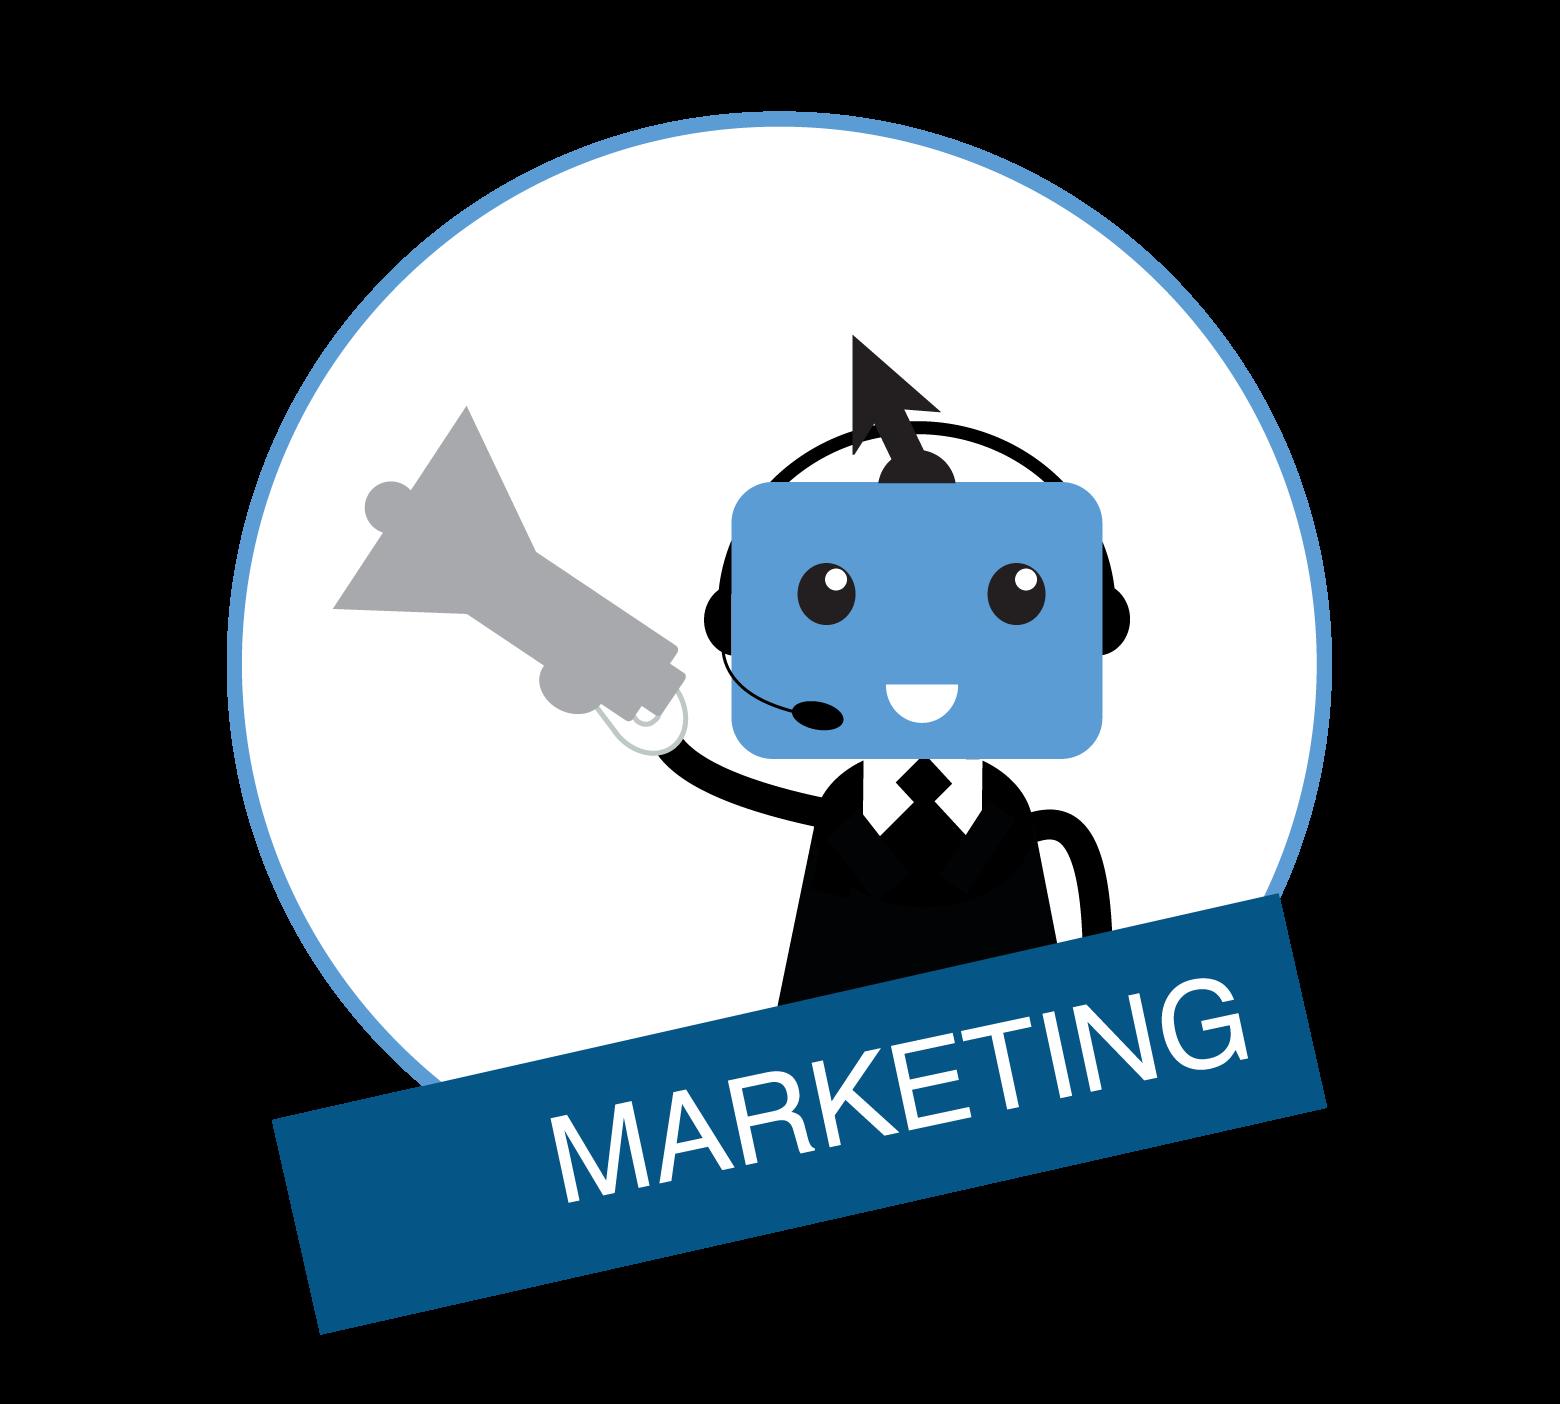 marketingicon.png